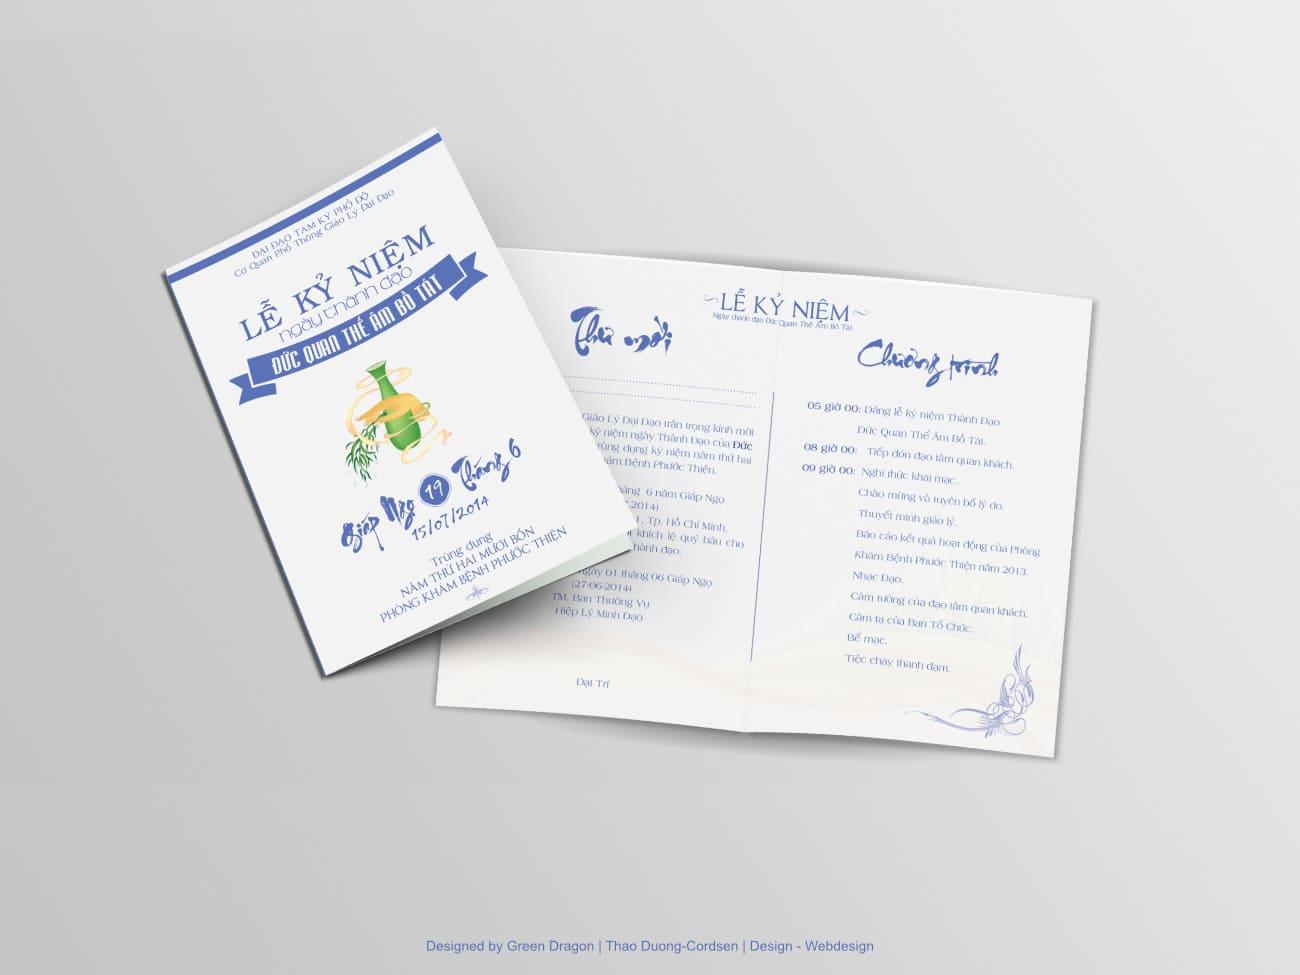 Praying-Invitation